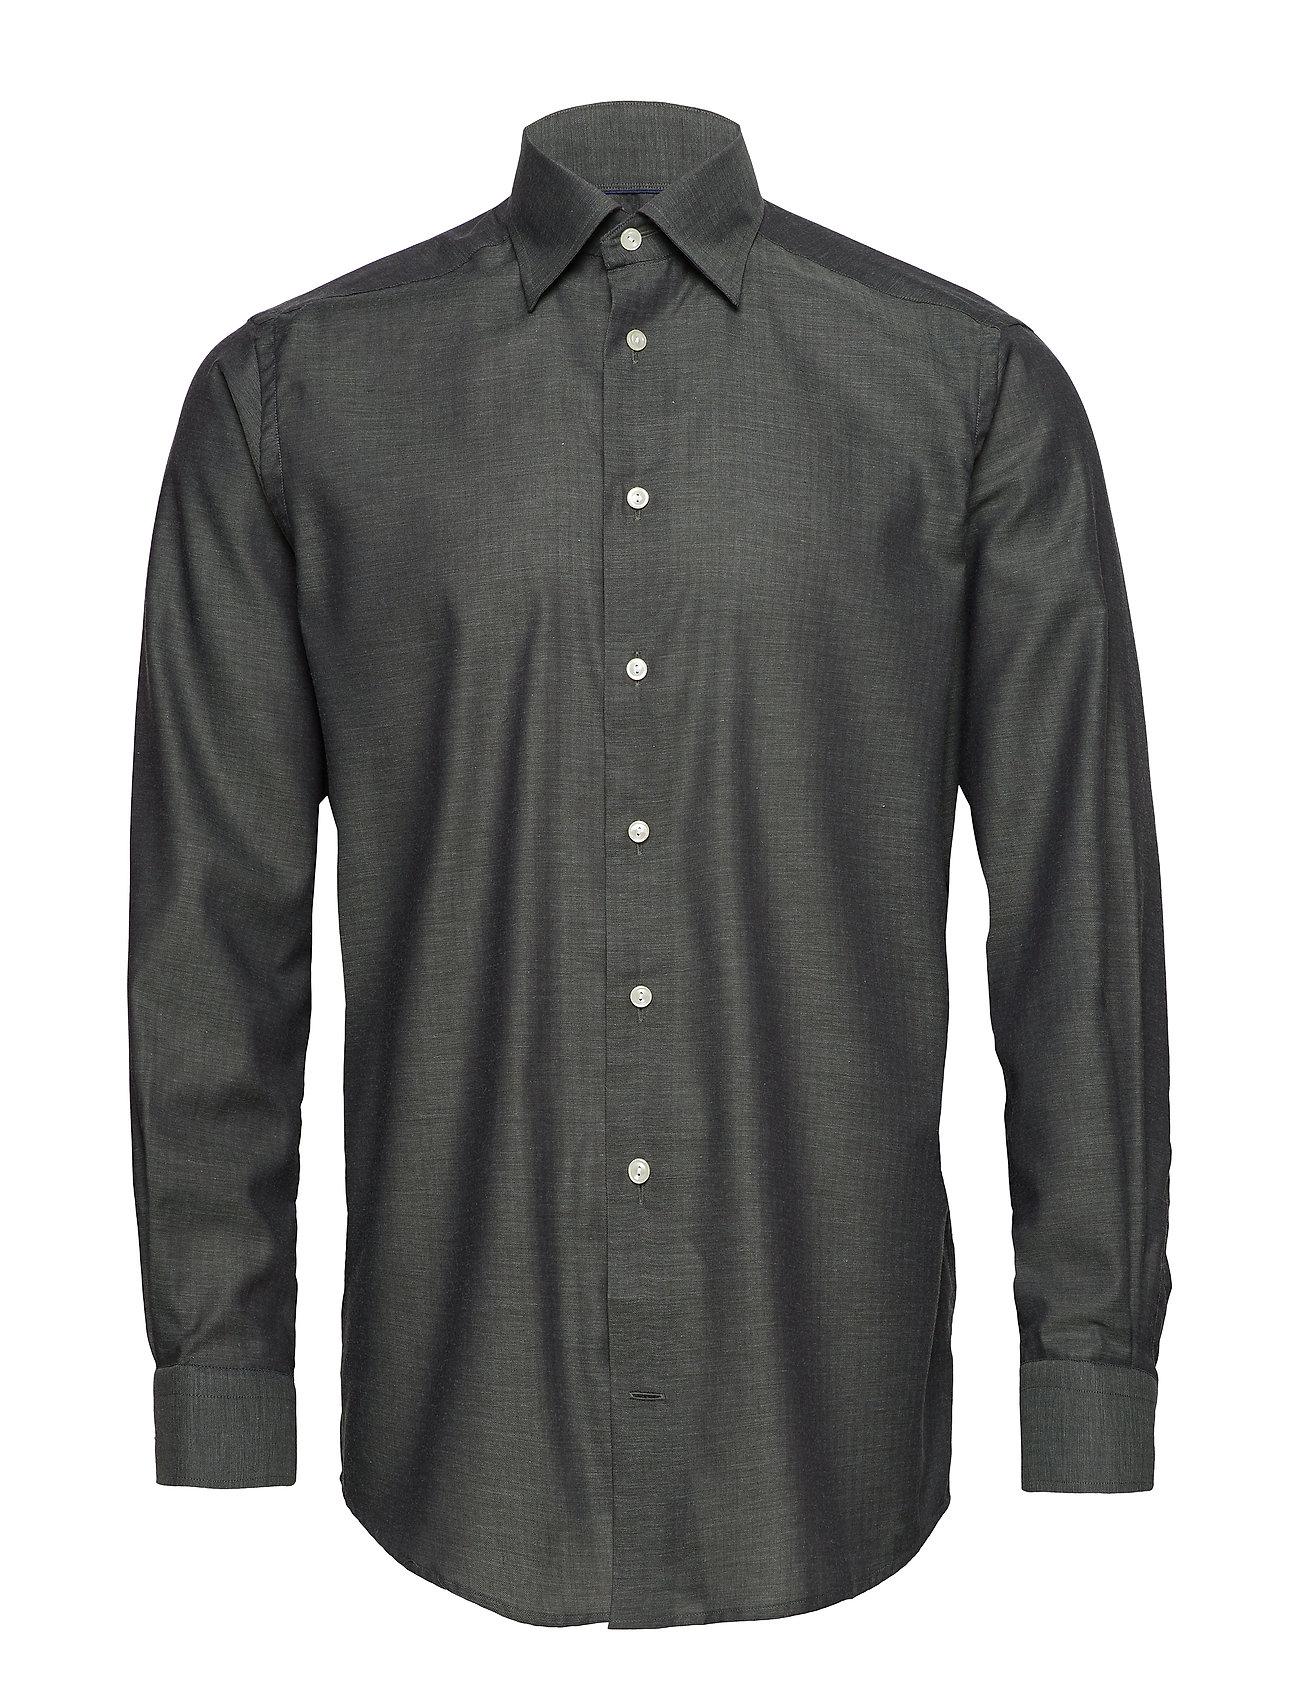 Eton grön Herringbone Flannel Shirt Ögrönlar